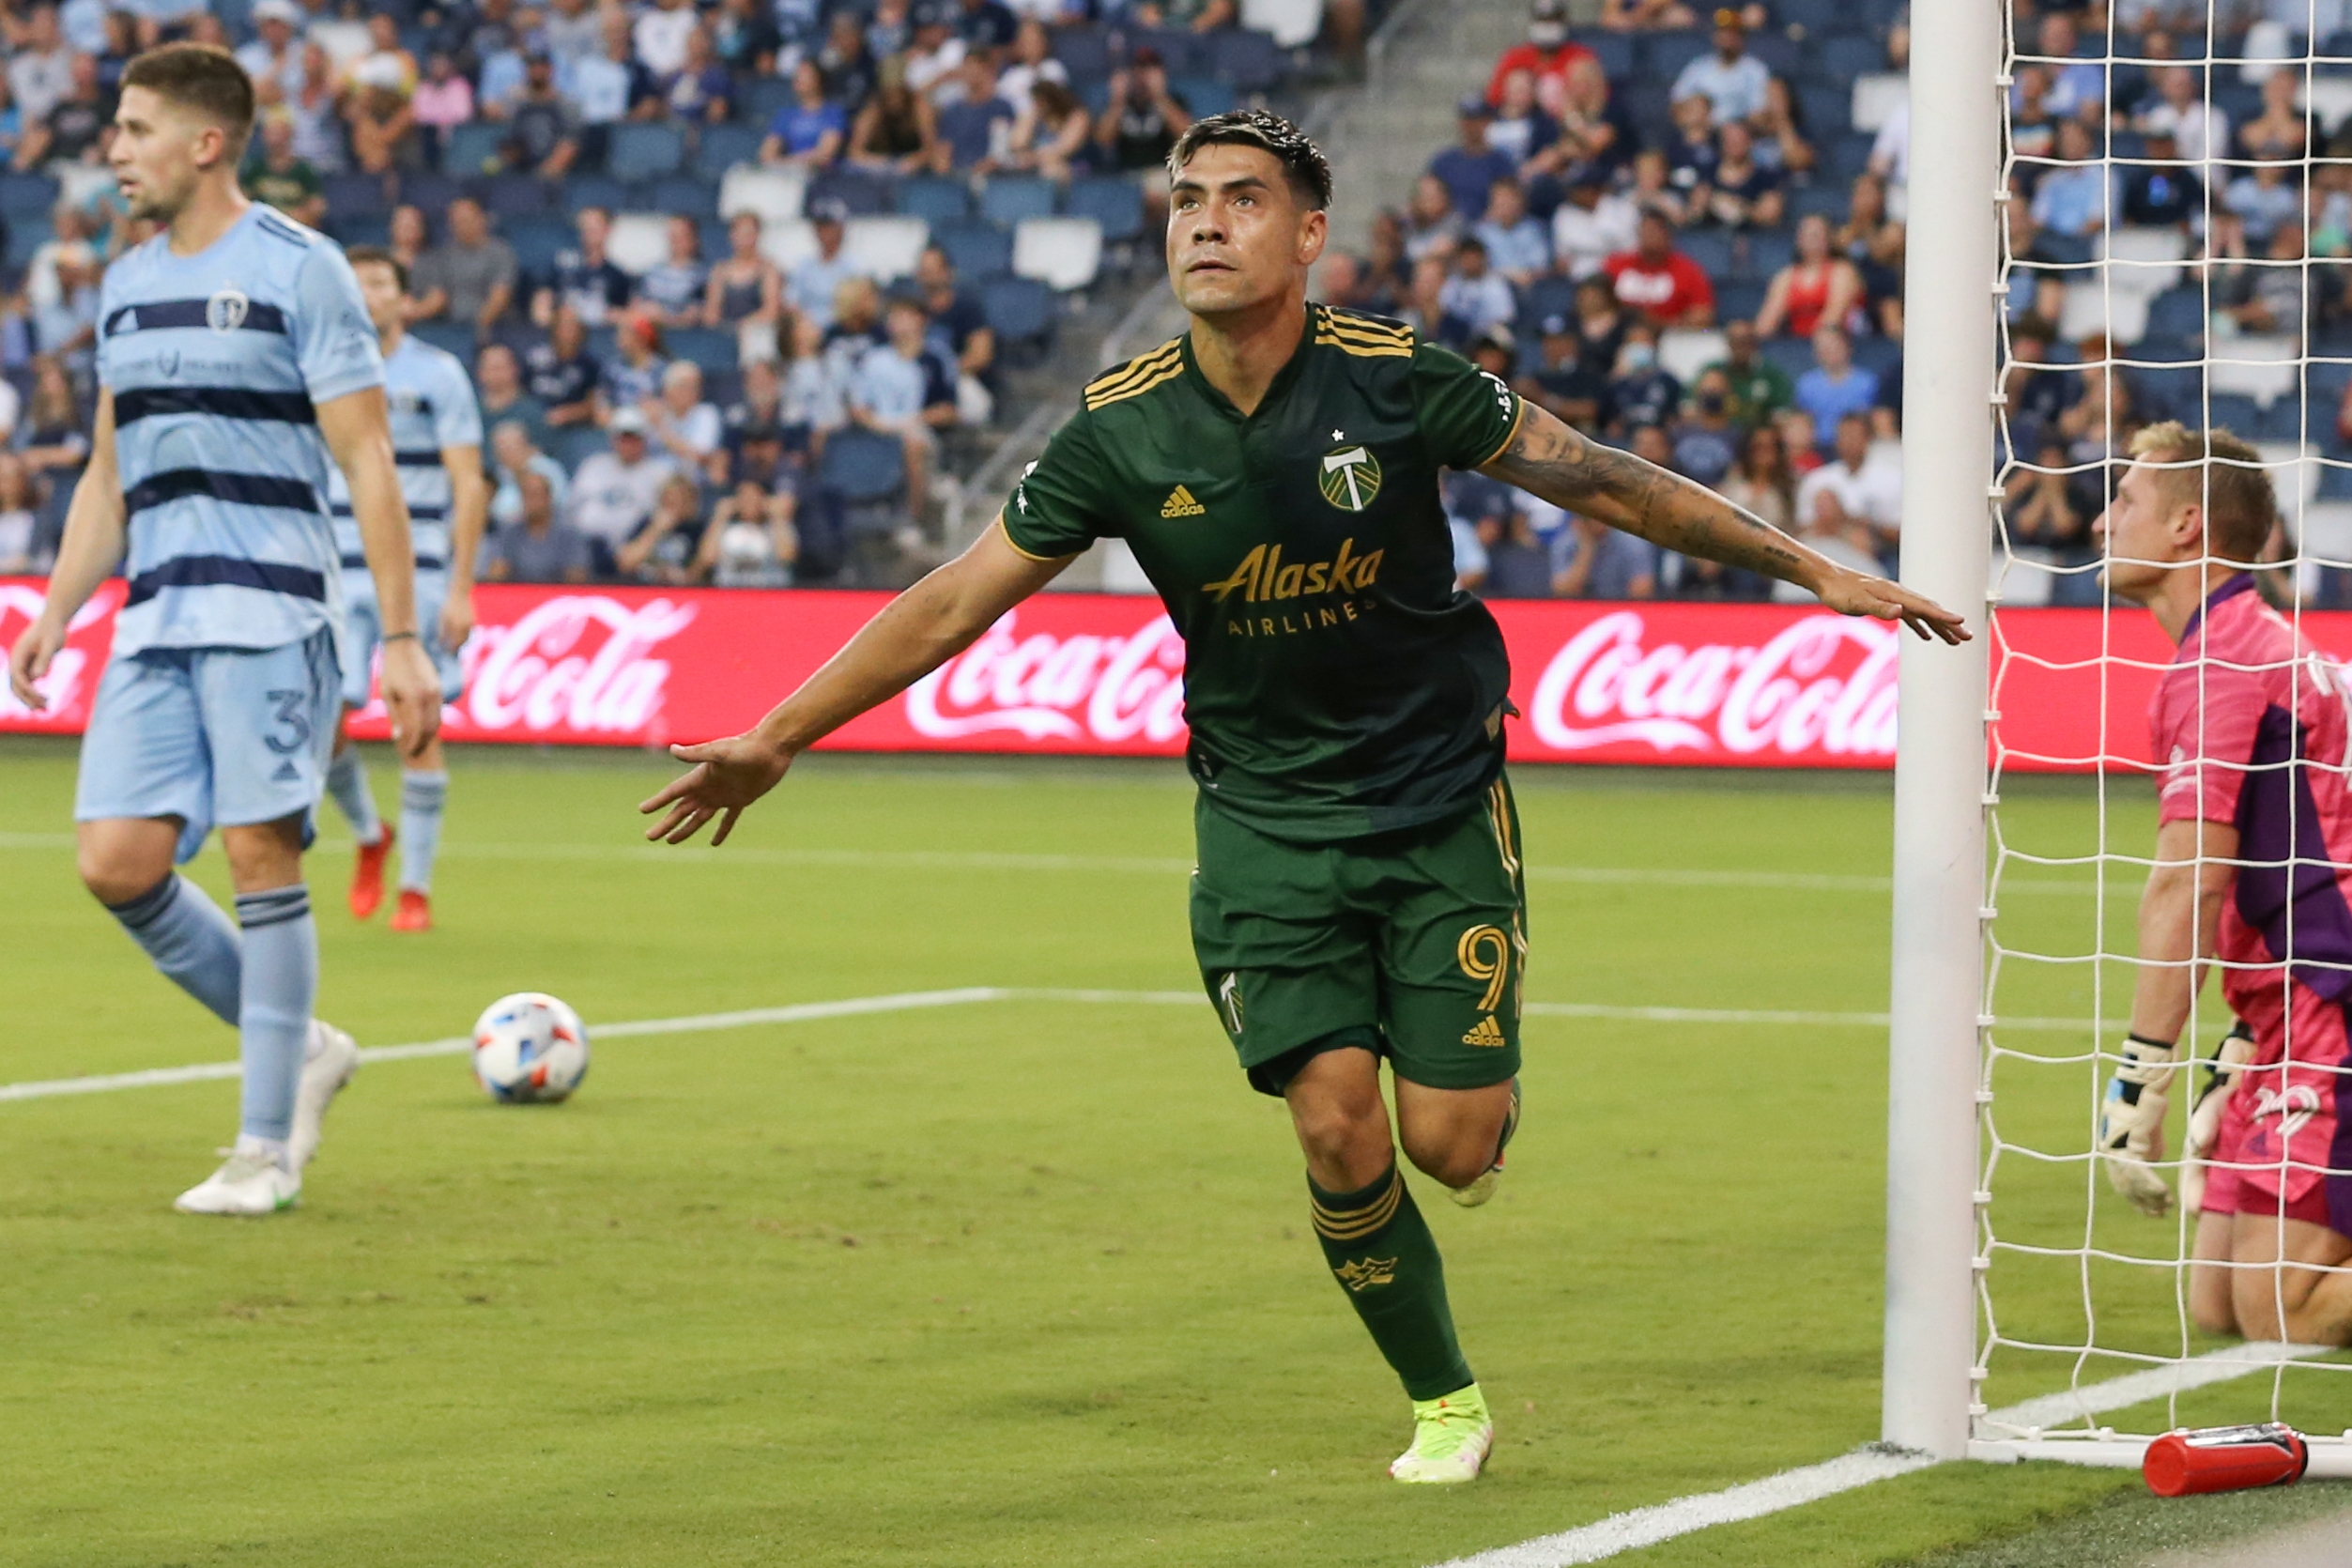 SOCCER: AUG 18 MLS - Portland Timbers at Sporting Kansas City